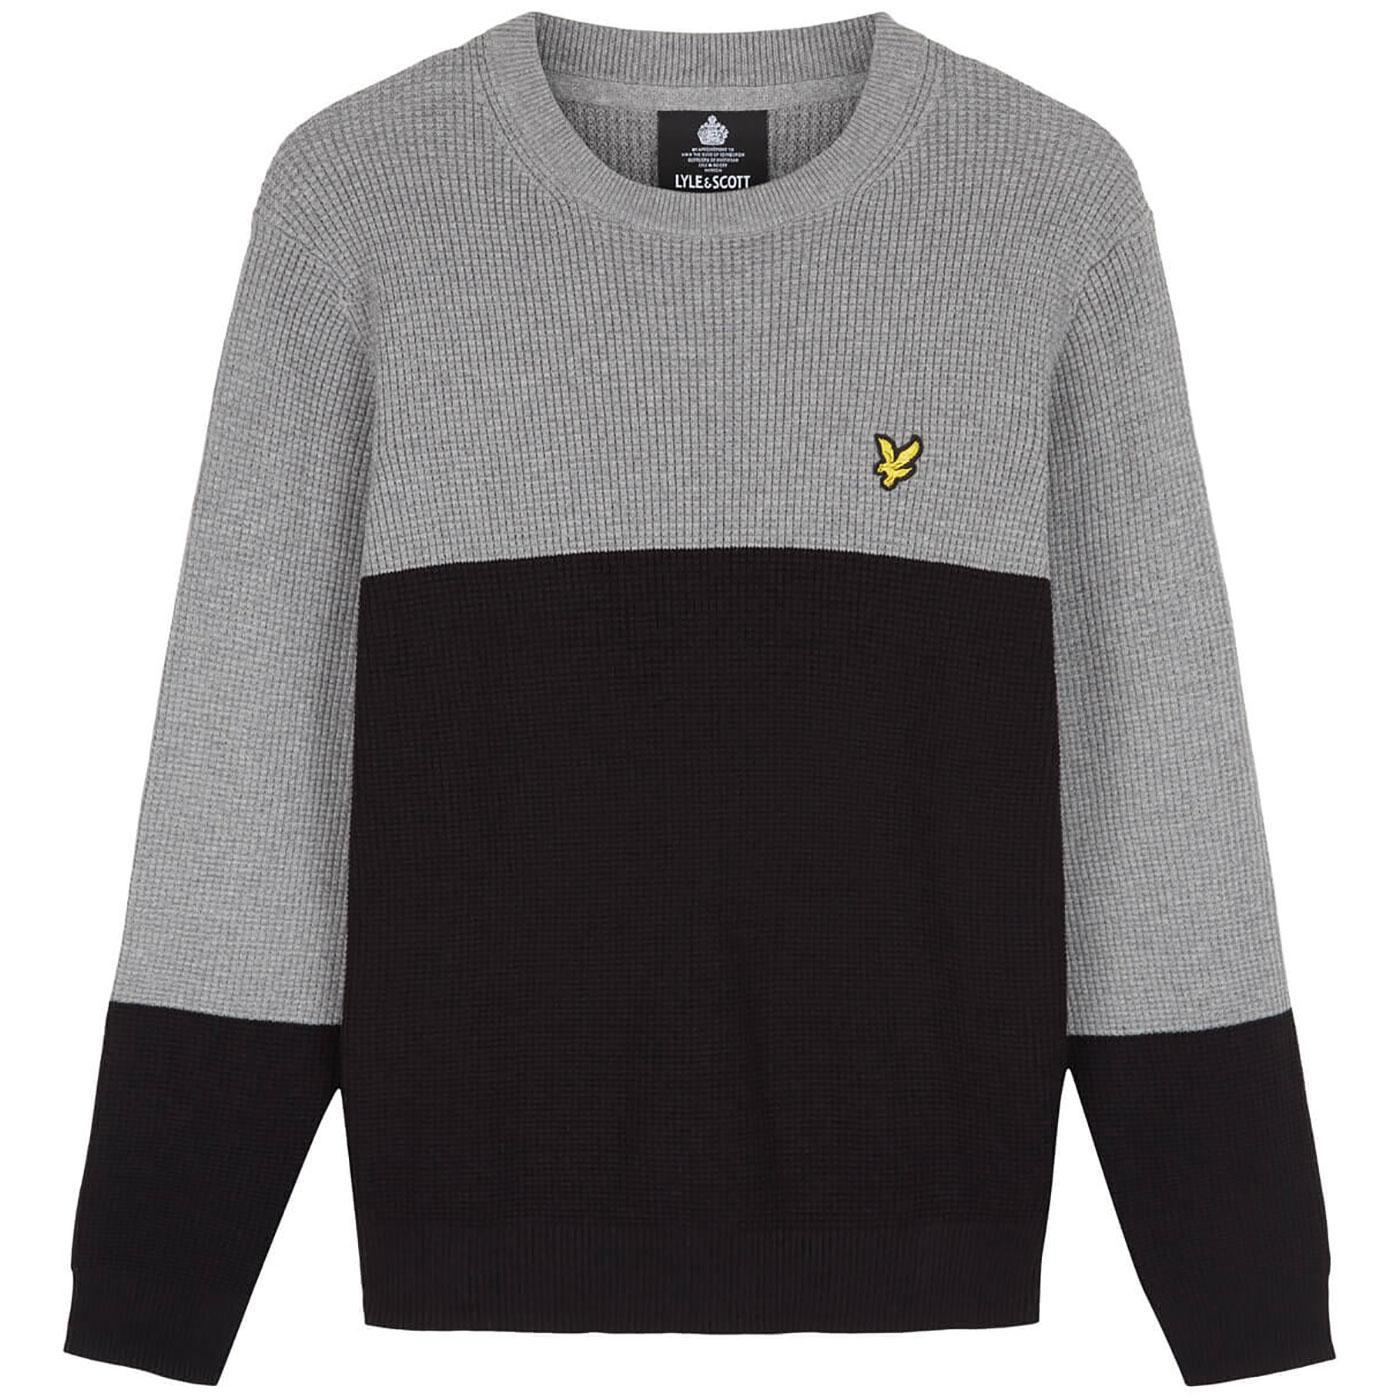 LYLE & SCOTT Retro Knitted Colour Block Jumper